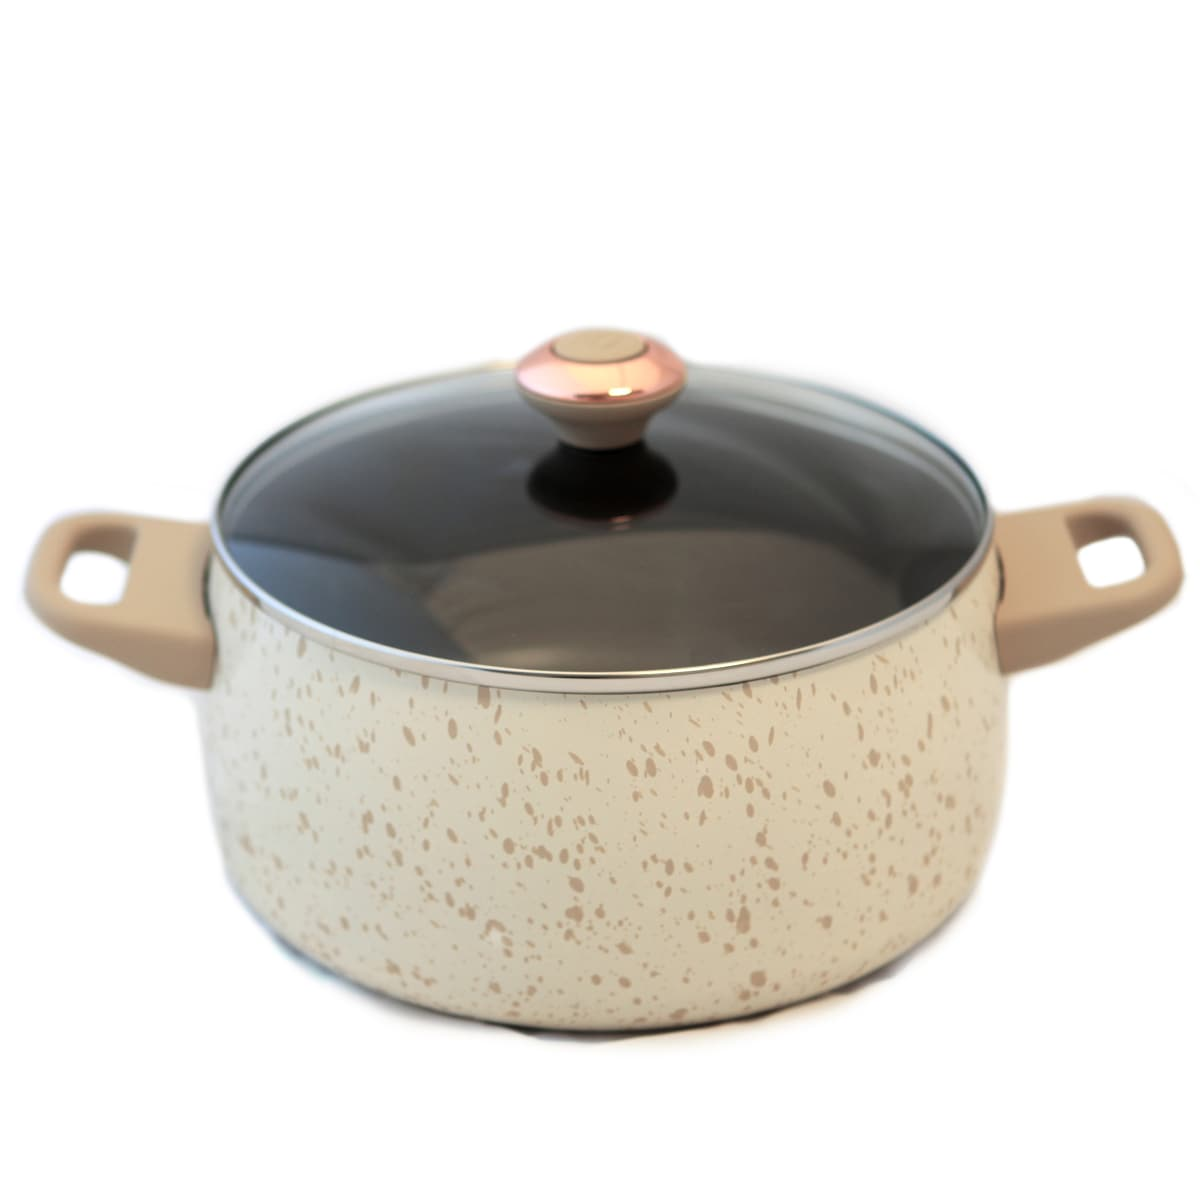 Paula Deen Signature Porcelain 'Oatmeal' 6-quart Stockpot